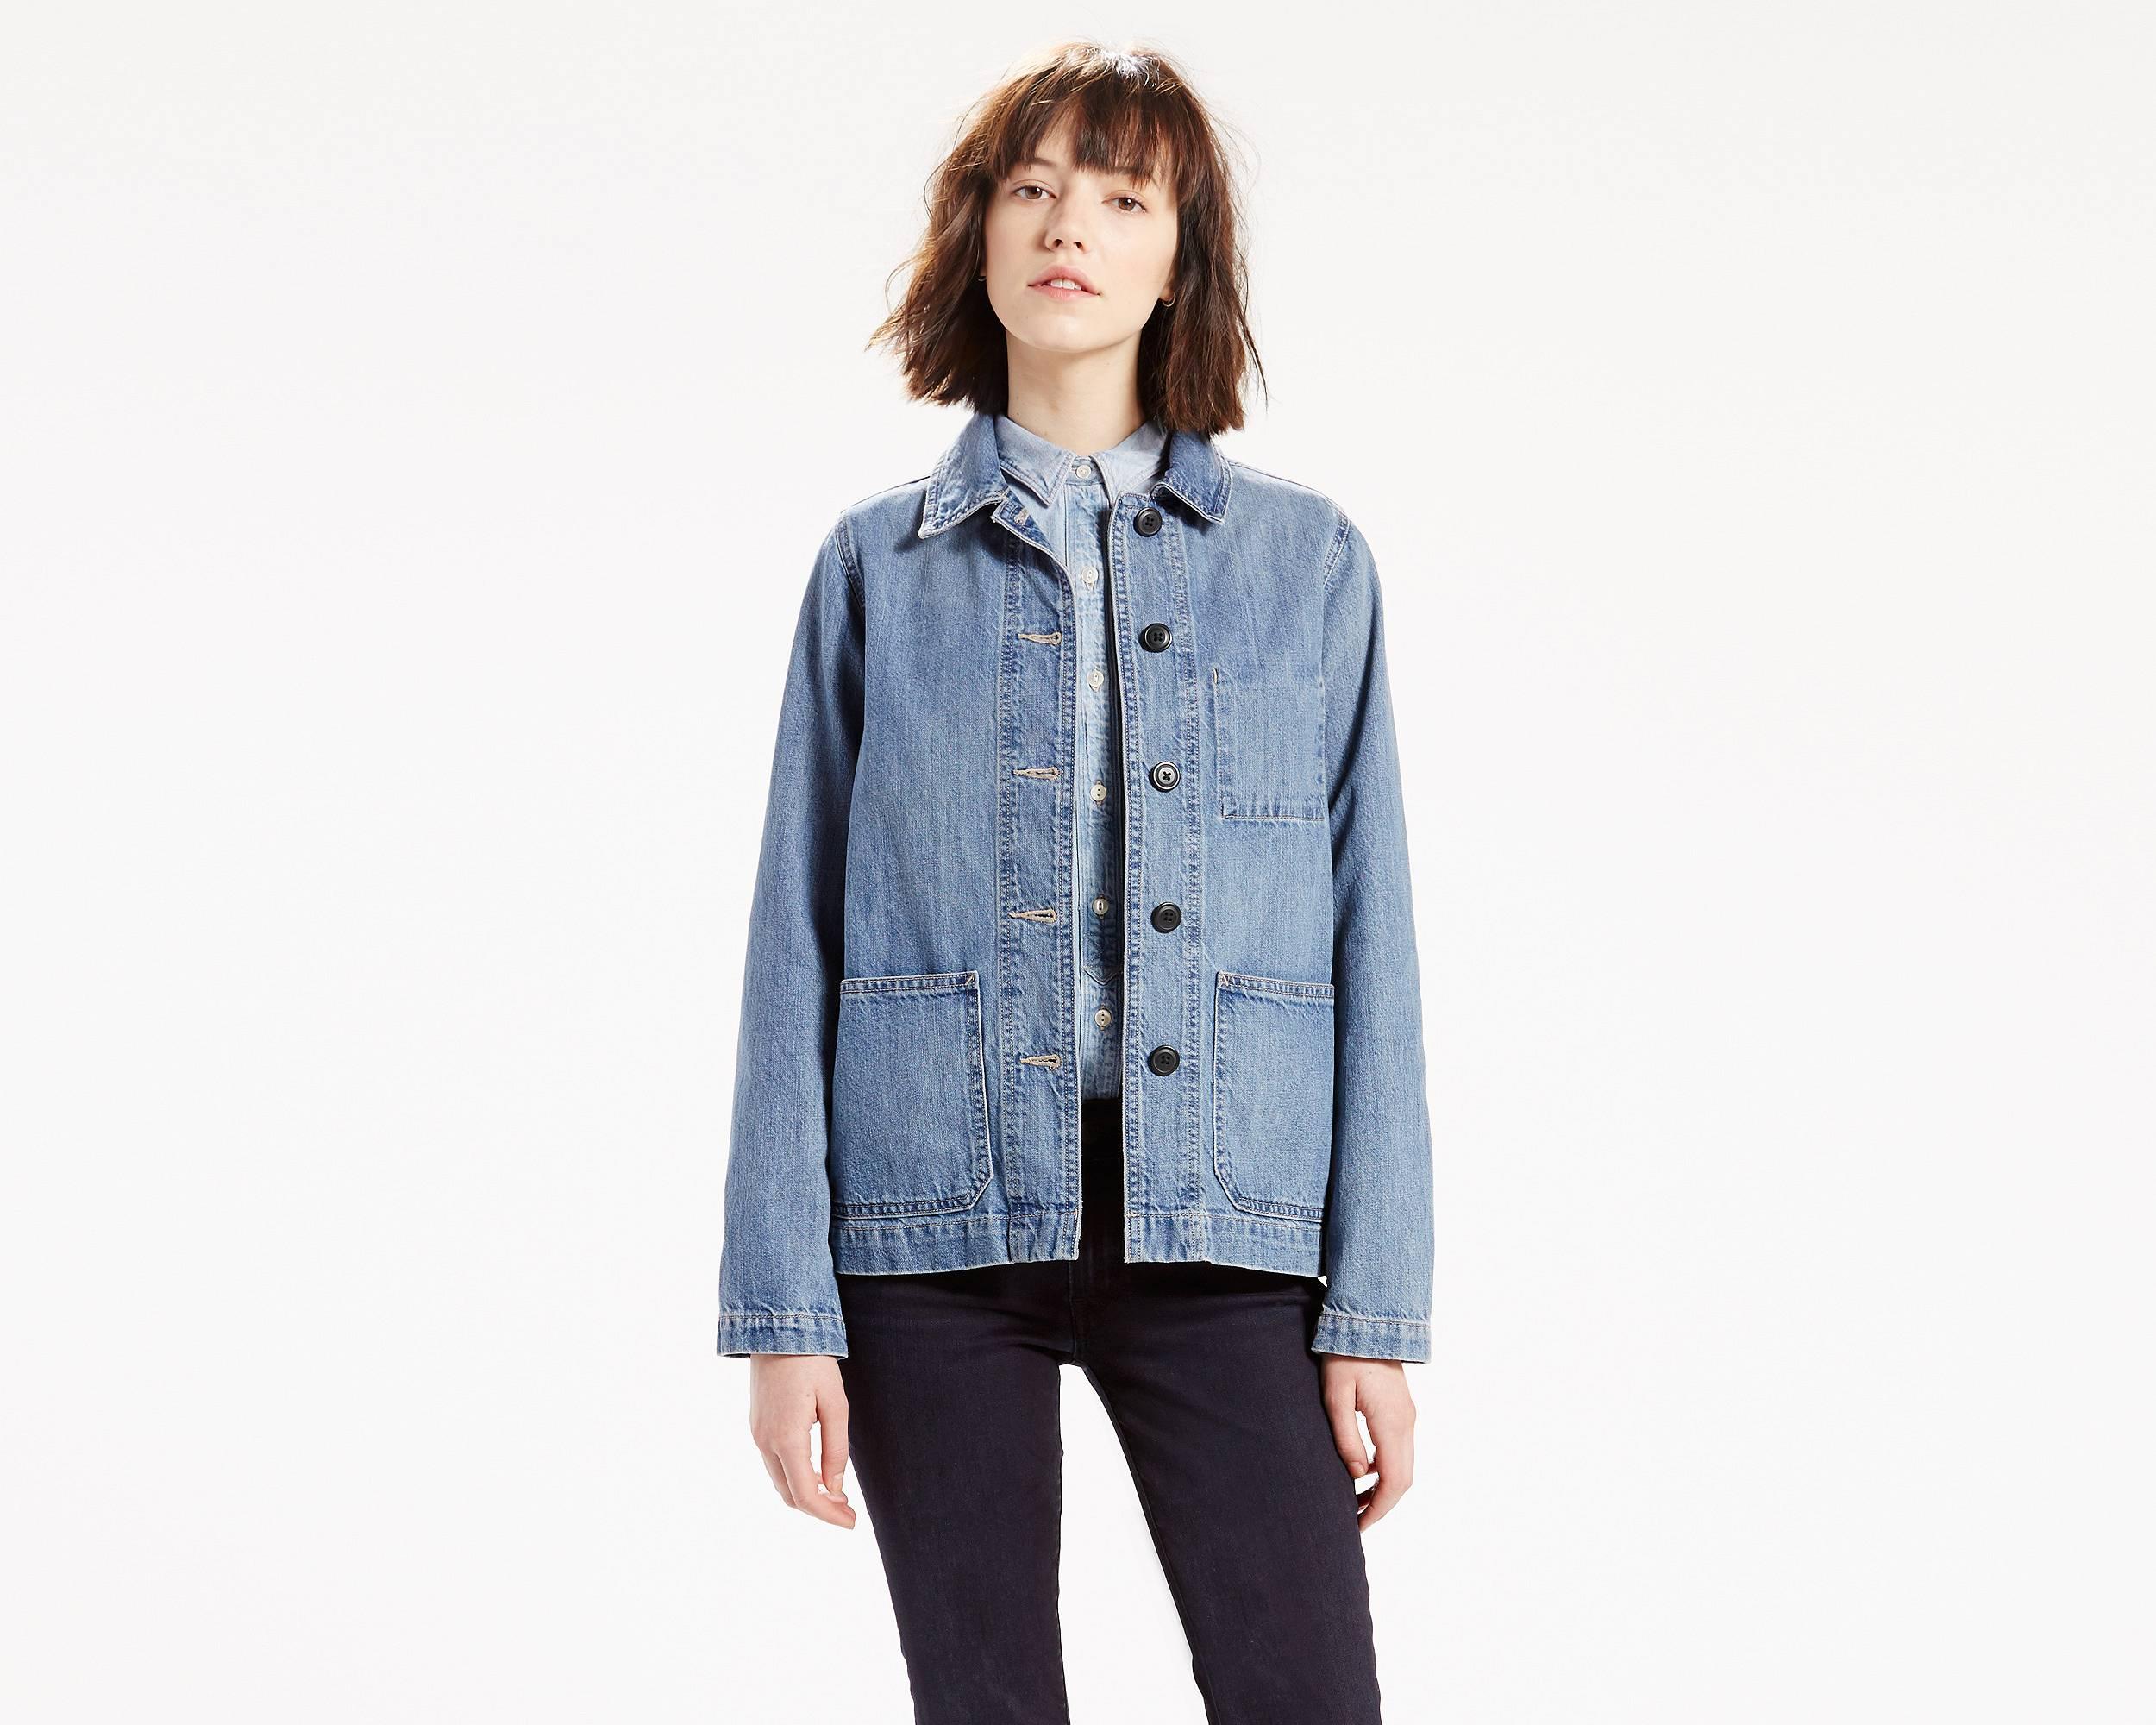 Jackets for Women - Shop Women's Casual Jackets | Levi's®